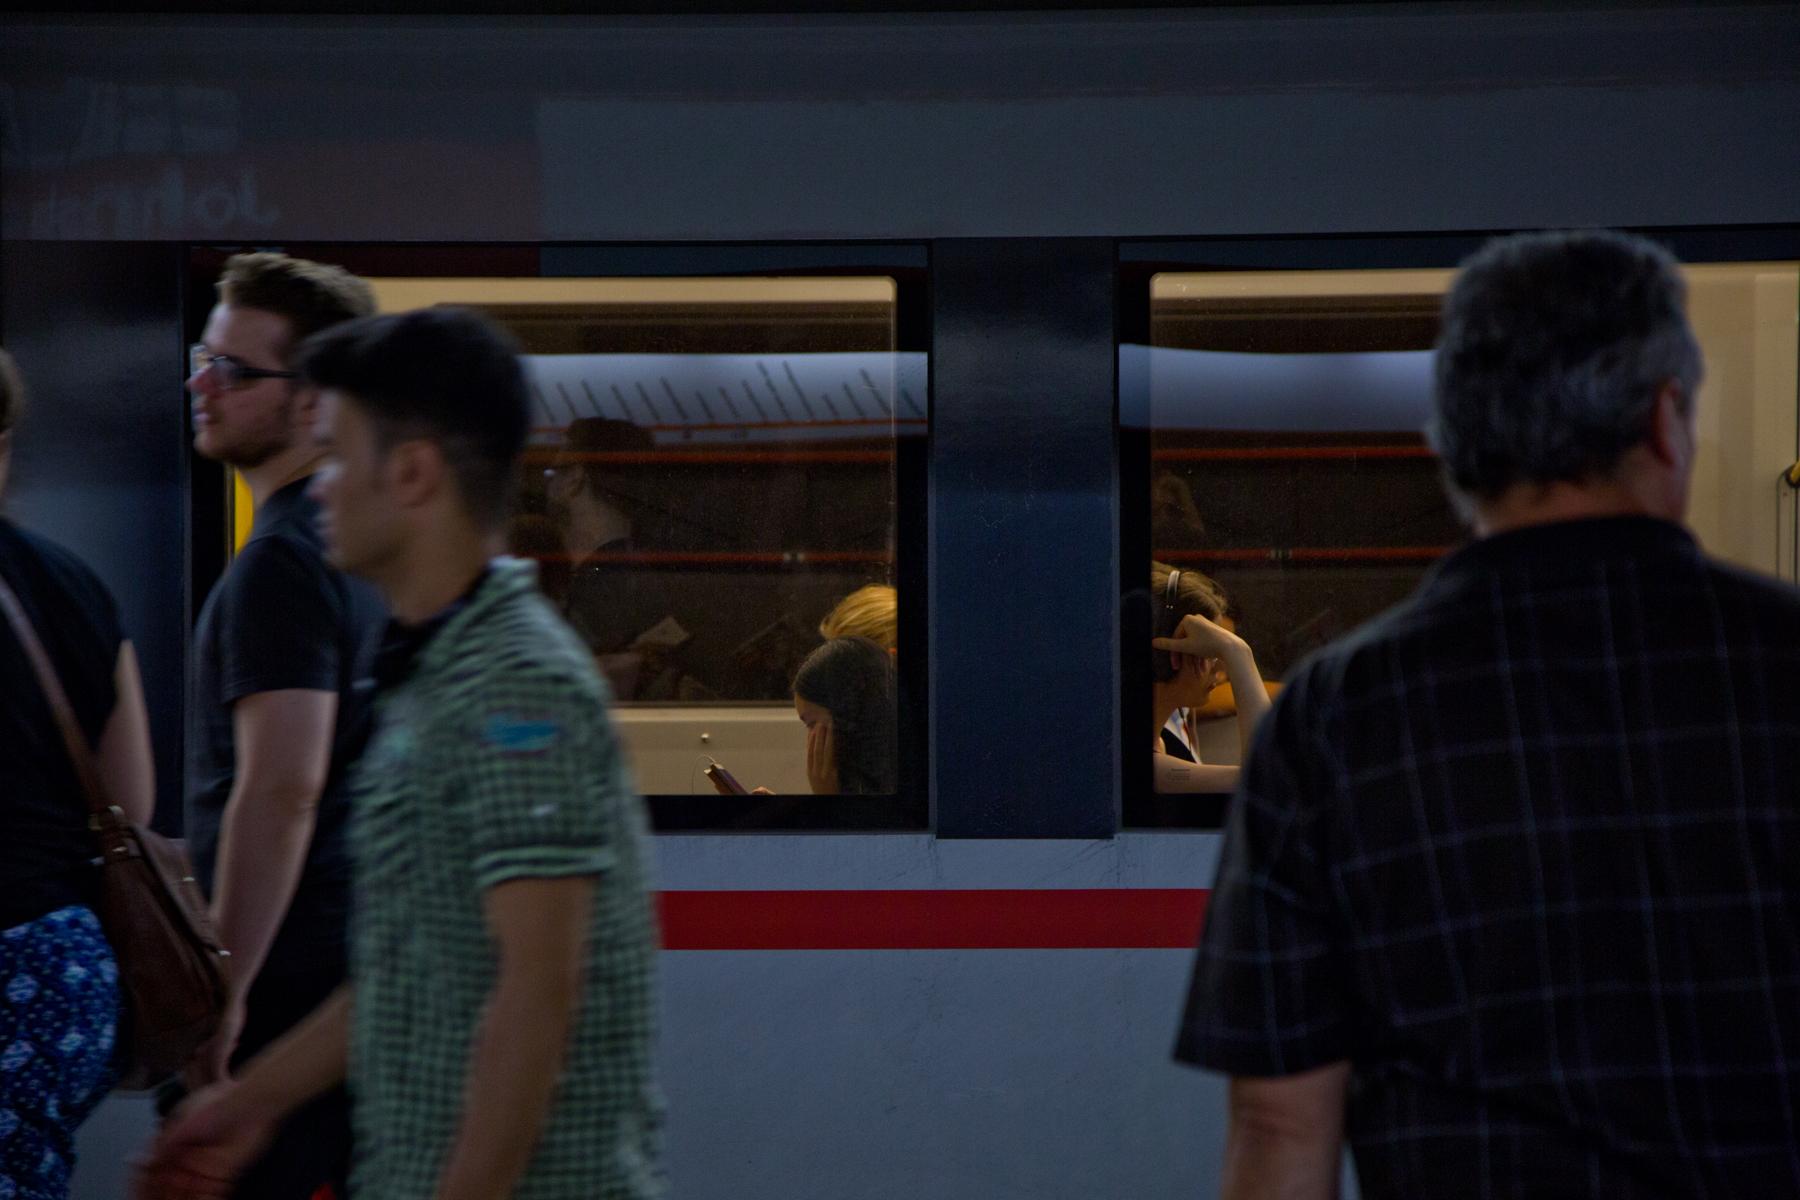 U-Bahn - U3